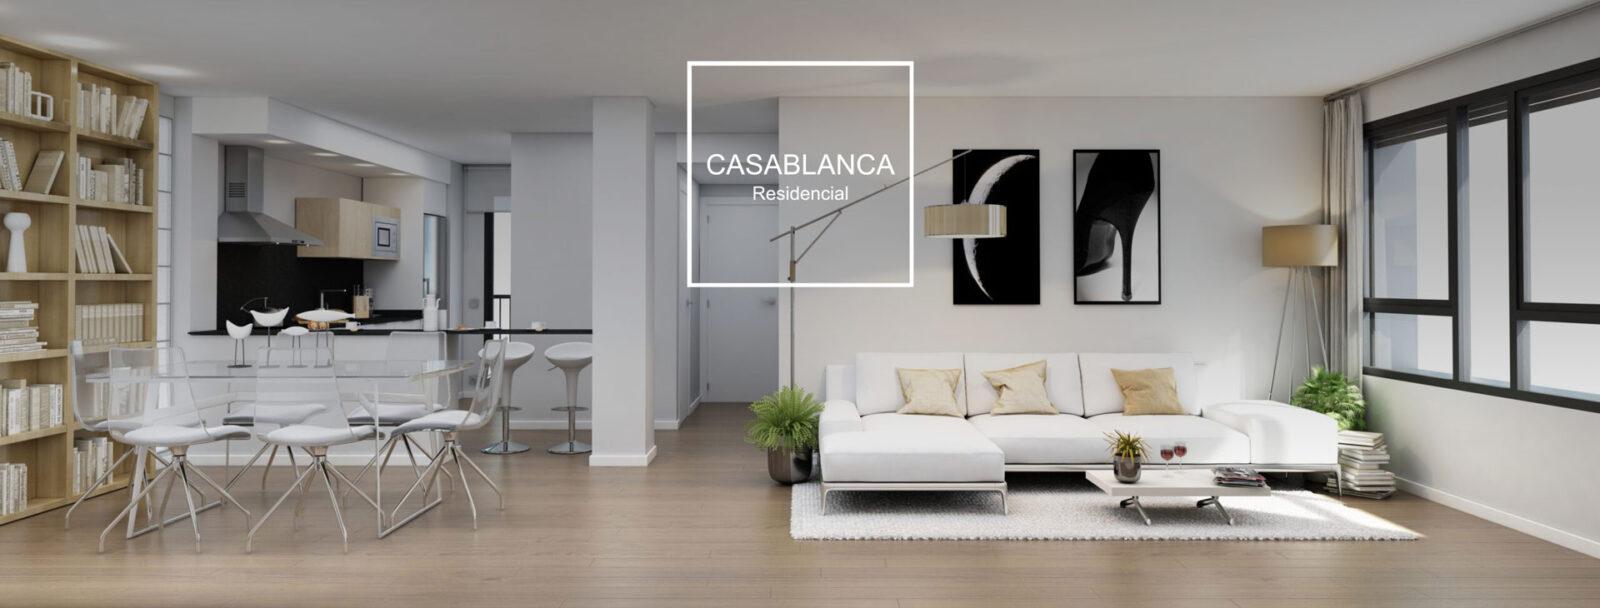 Casablanca Residencial - Retoque Segia Casablanca Salon Foto1 Scaled